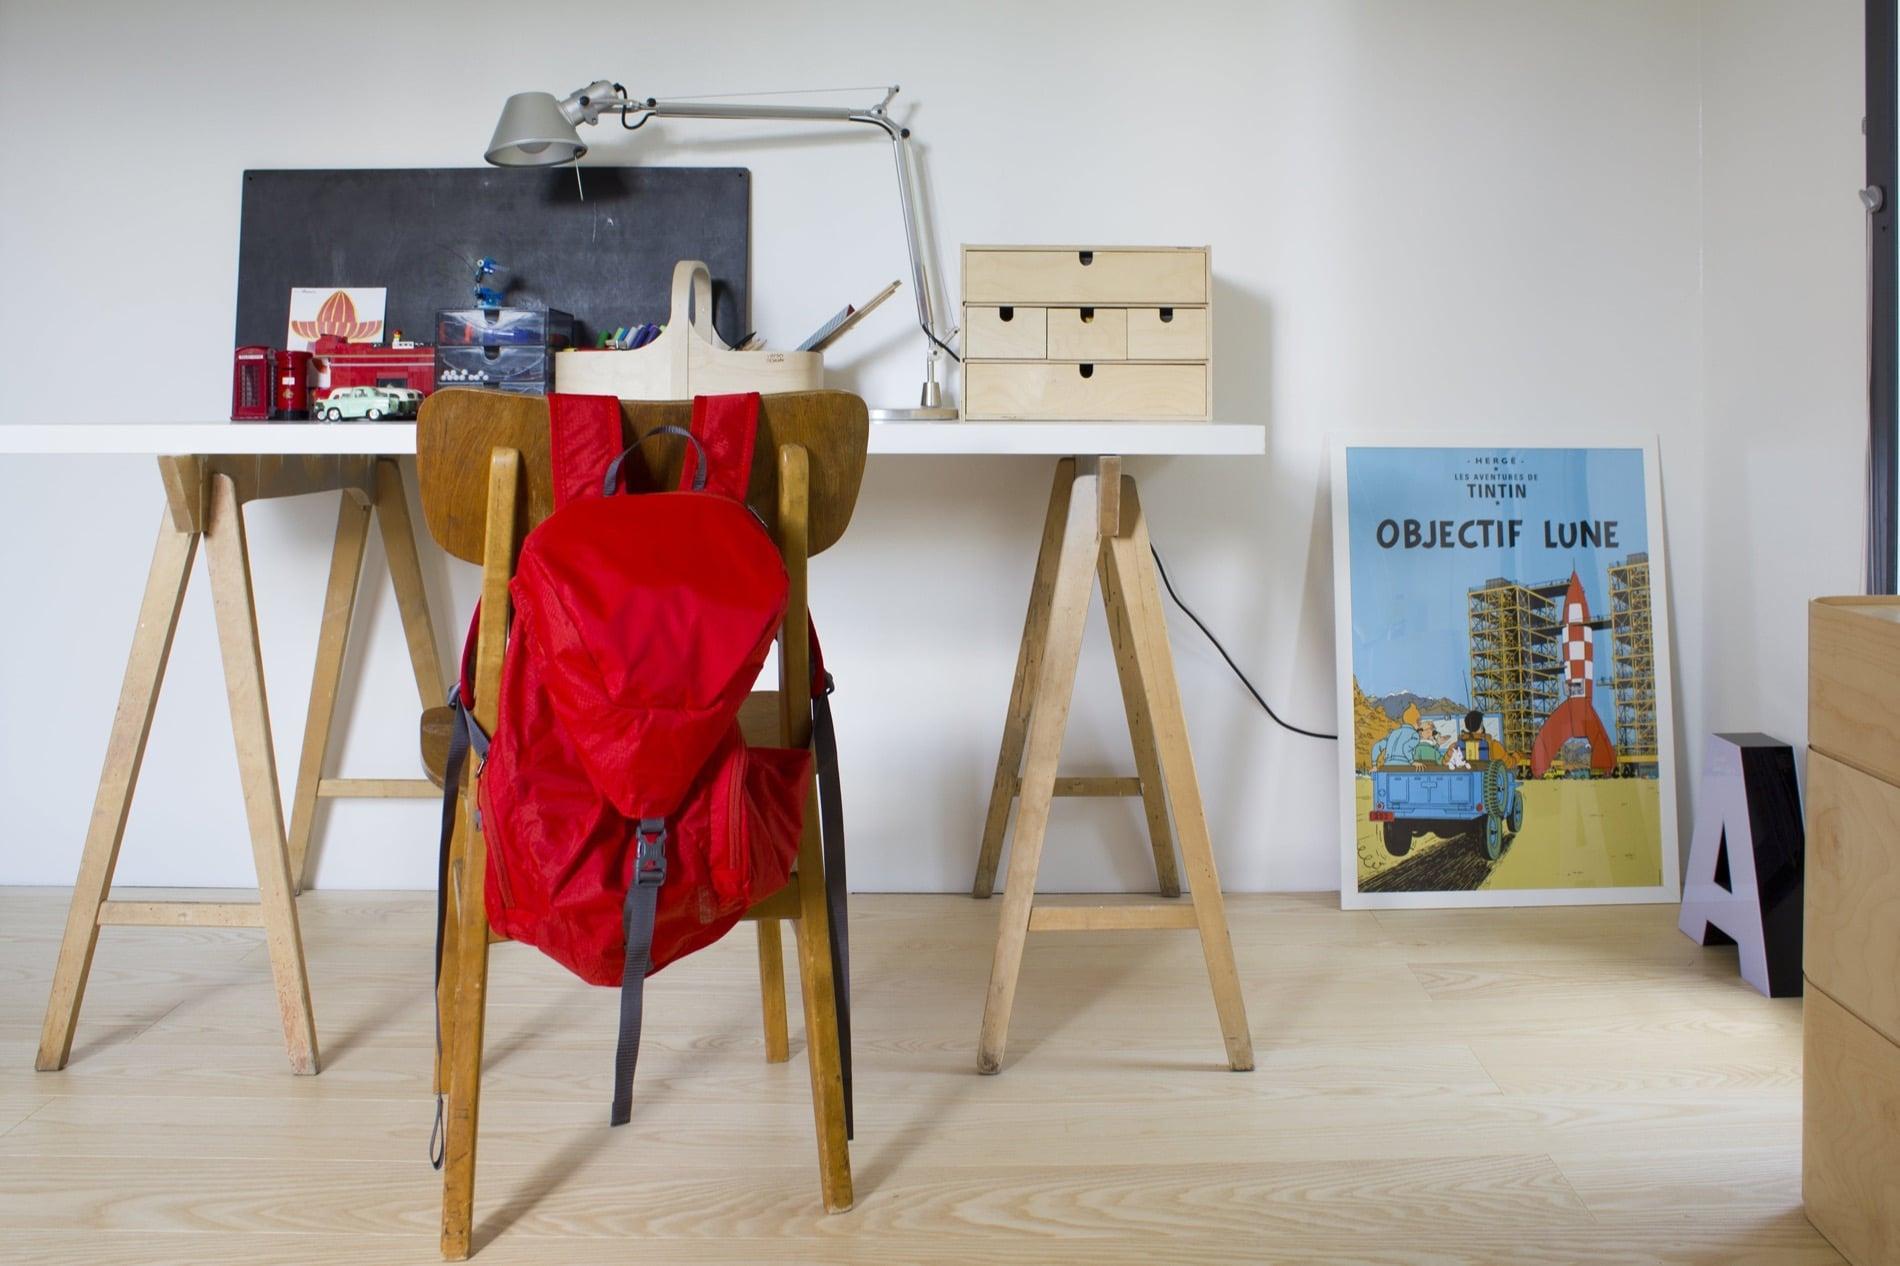 Timberwise parketti puulattia wooden floor parquet Saarni Ash Select îljyvaha wax oil_vaaka2